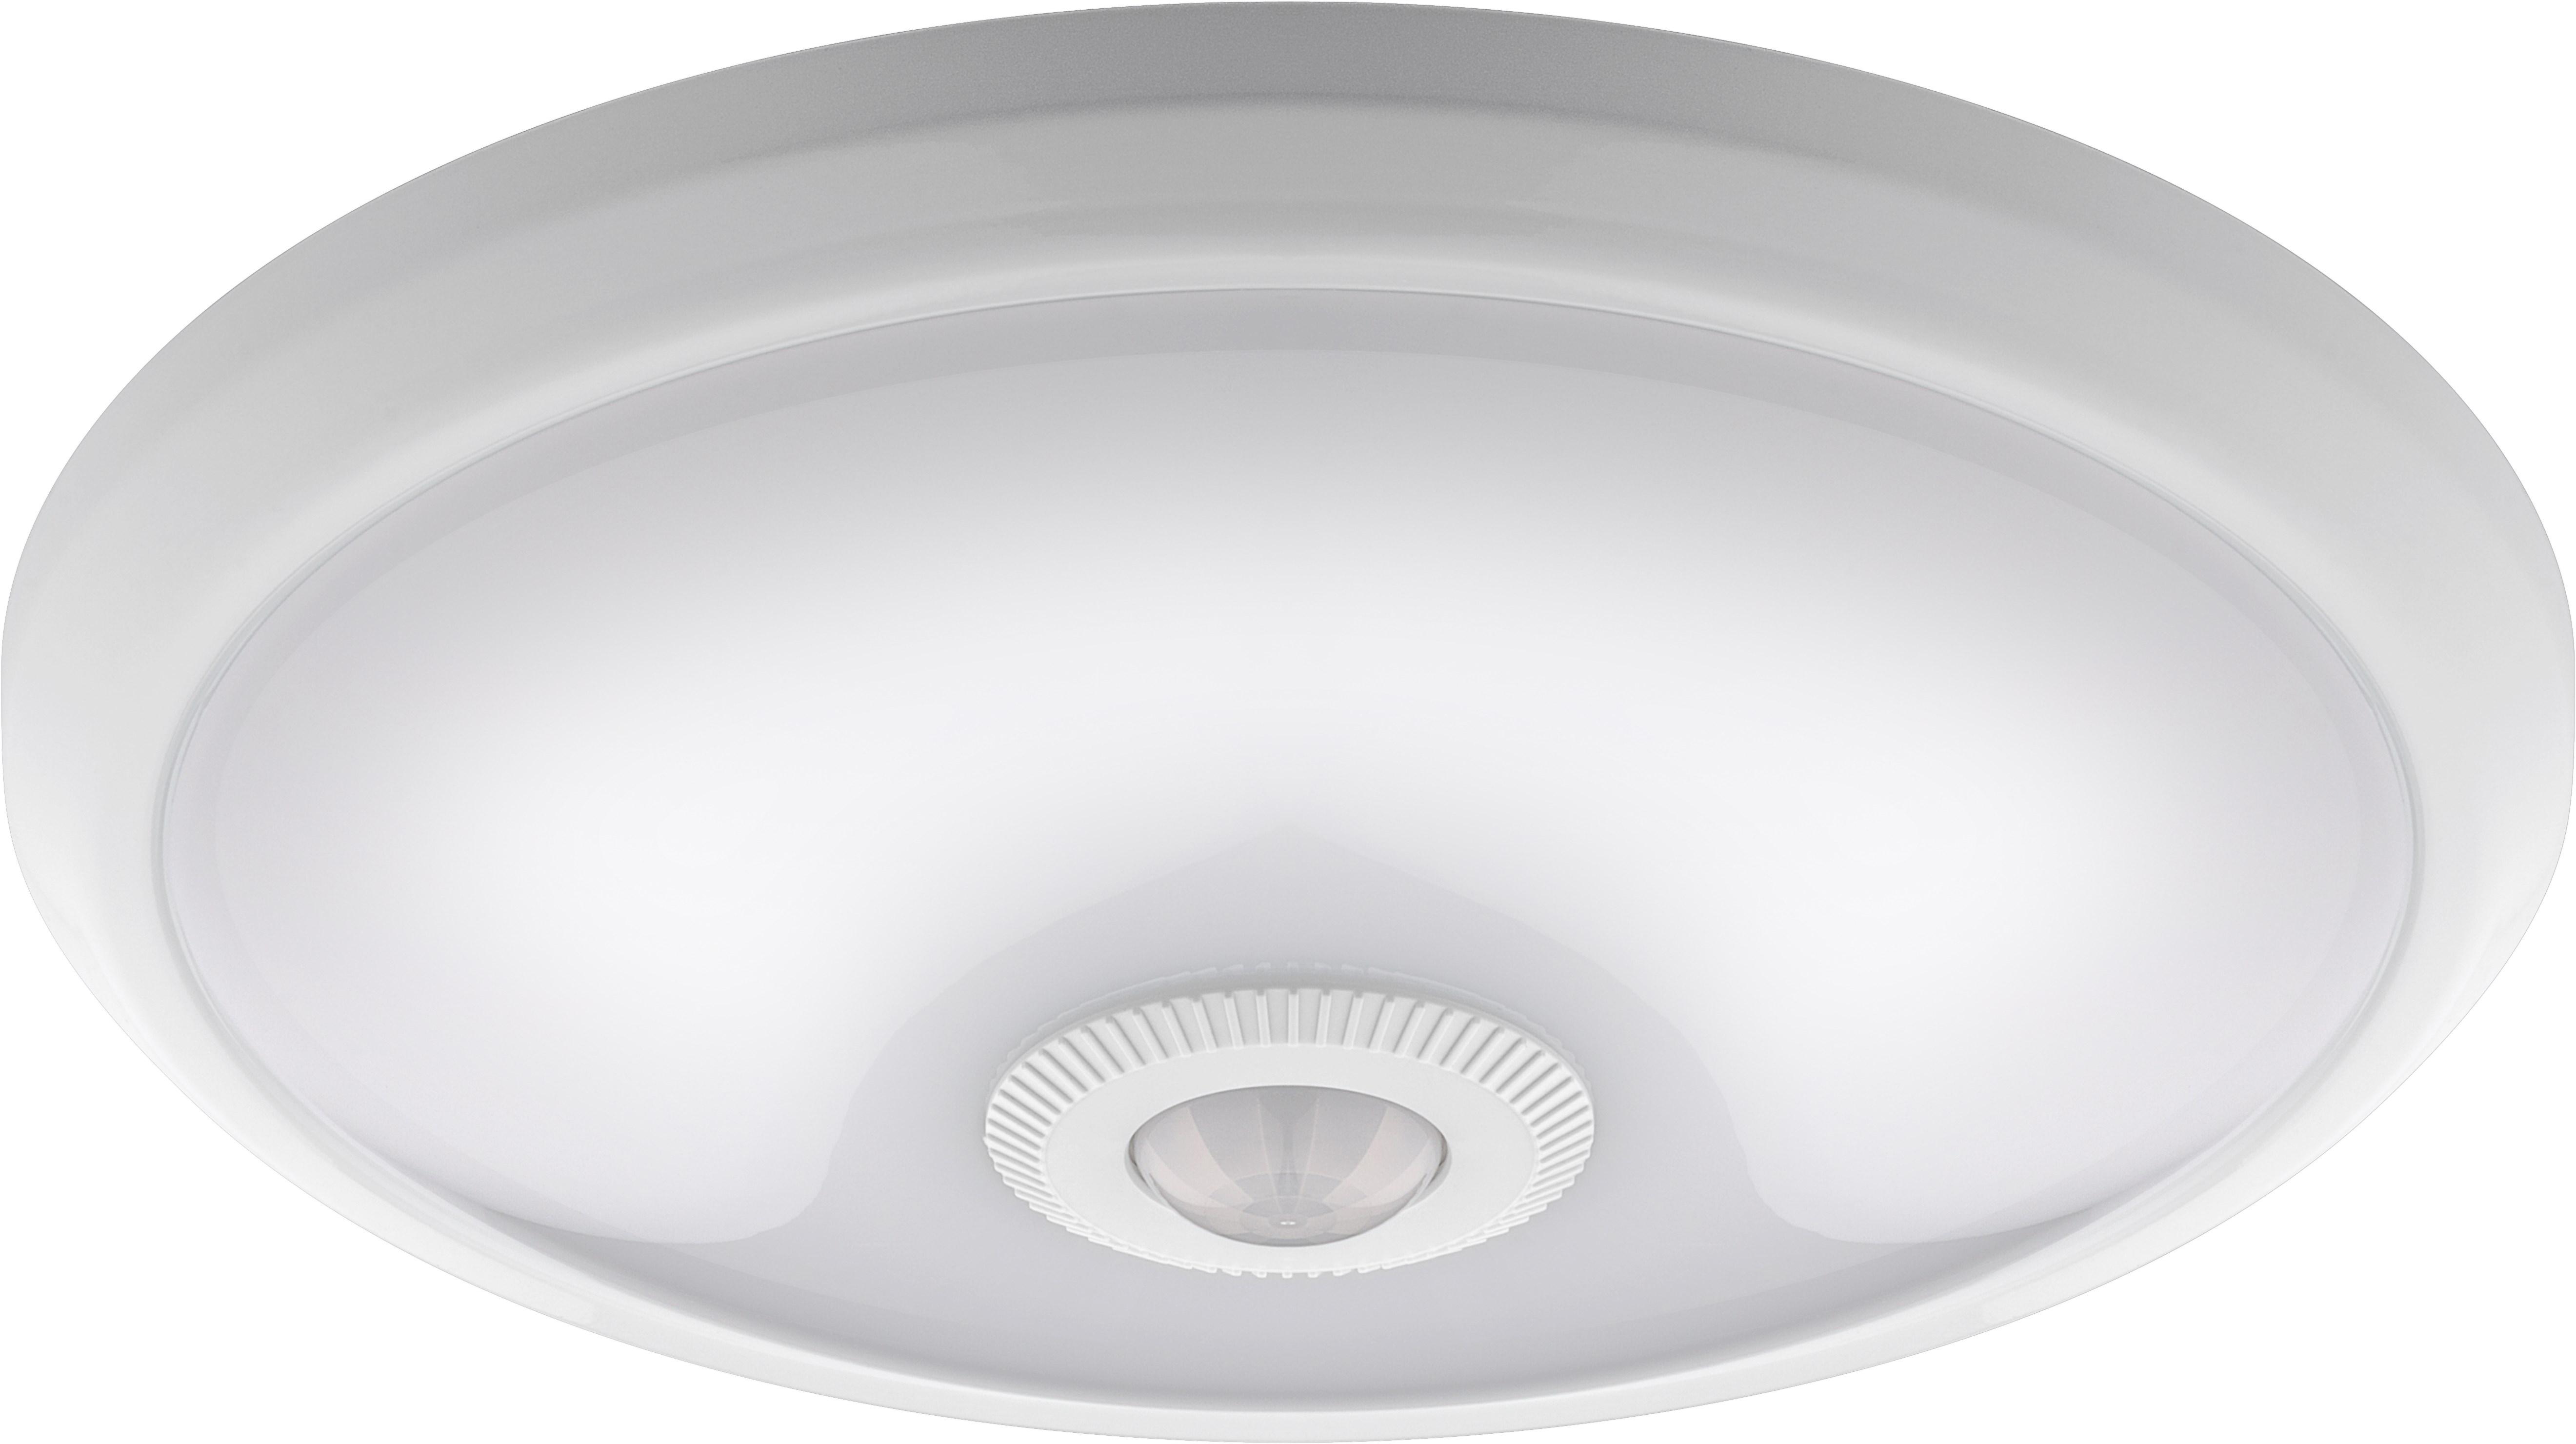 Plafoniera LED 12W 2700k cu senzor, Goobay [0]